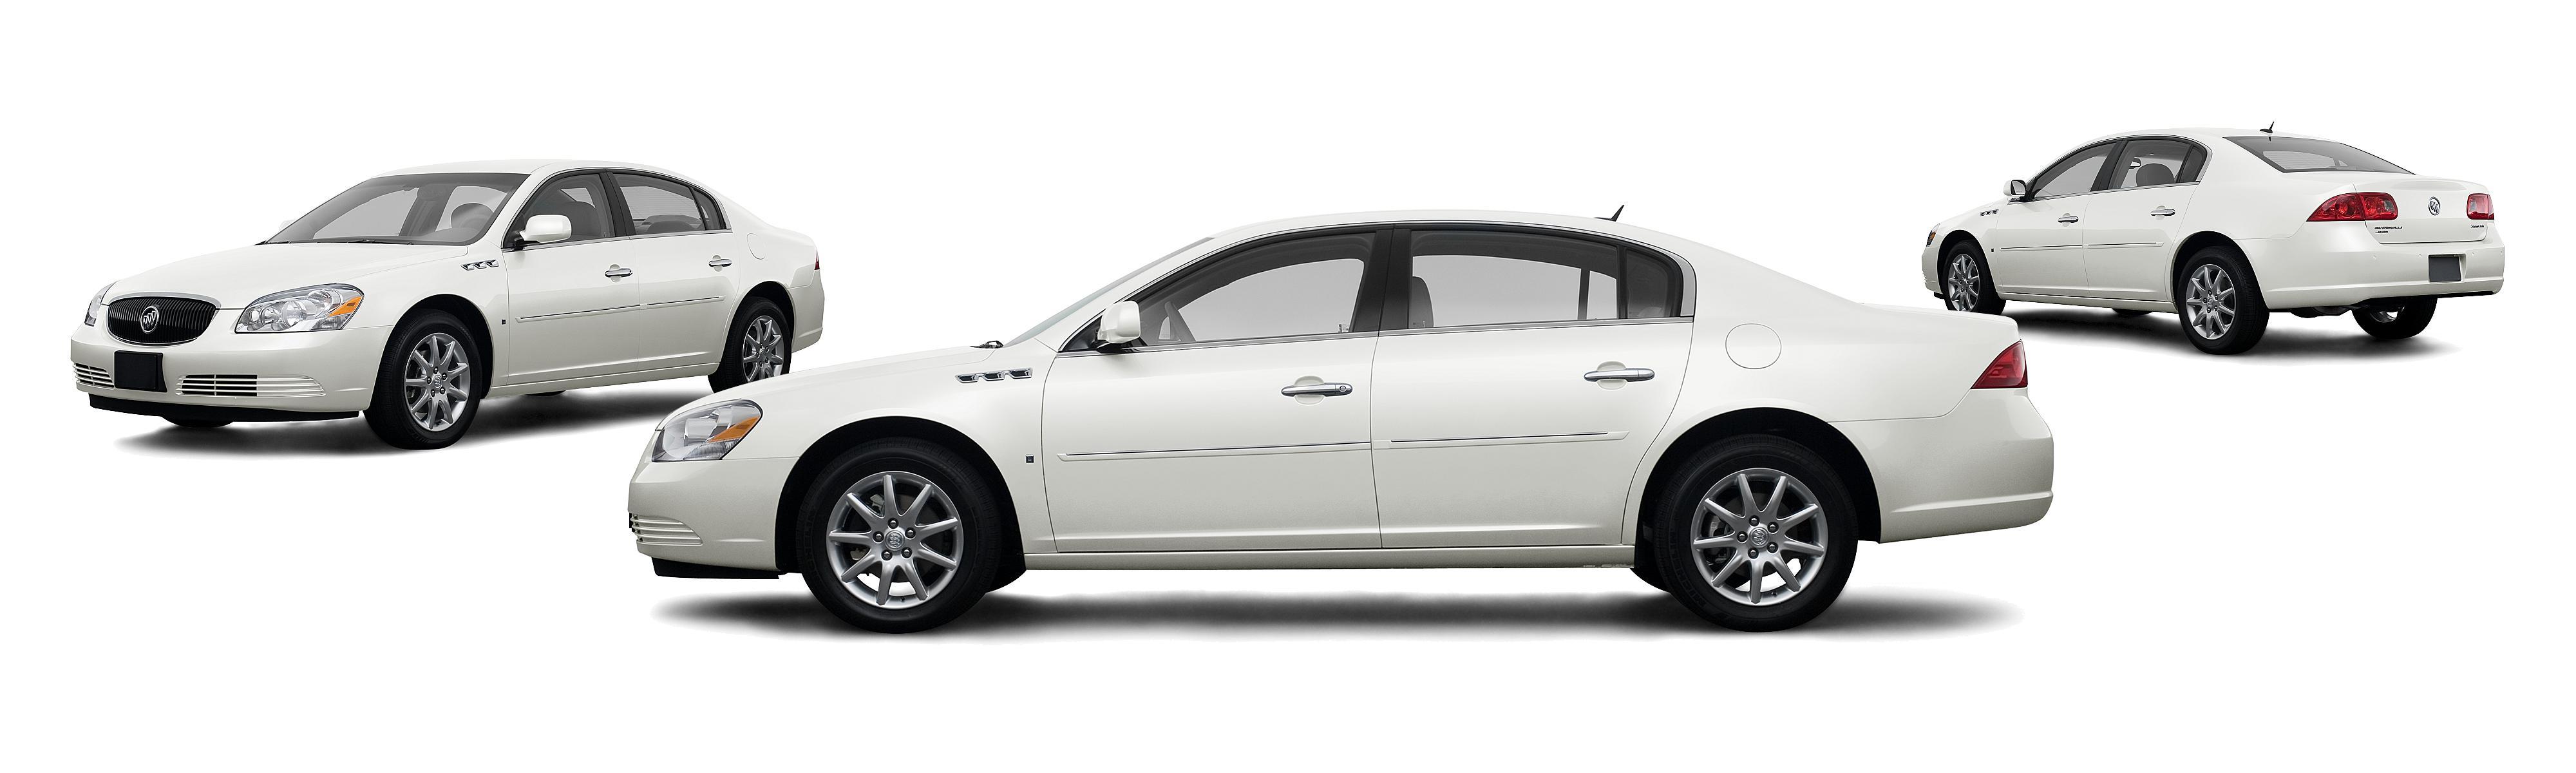 2009 buick lucerne cxl 4dr sedan w 5xl research groovecar rh groovecar com 2010 Buick Lucerne 2009 Buick Lucerne Recalls